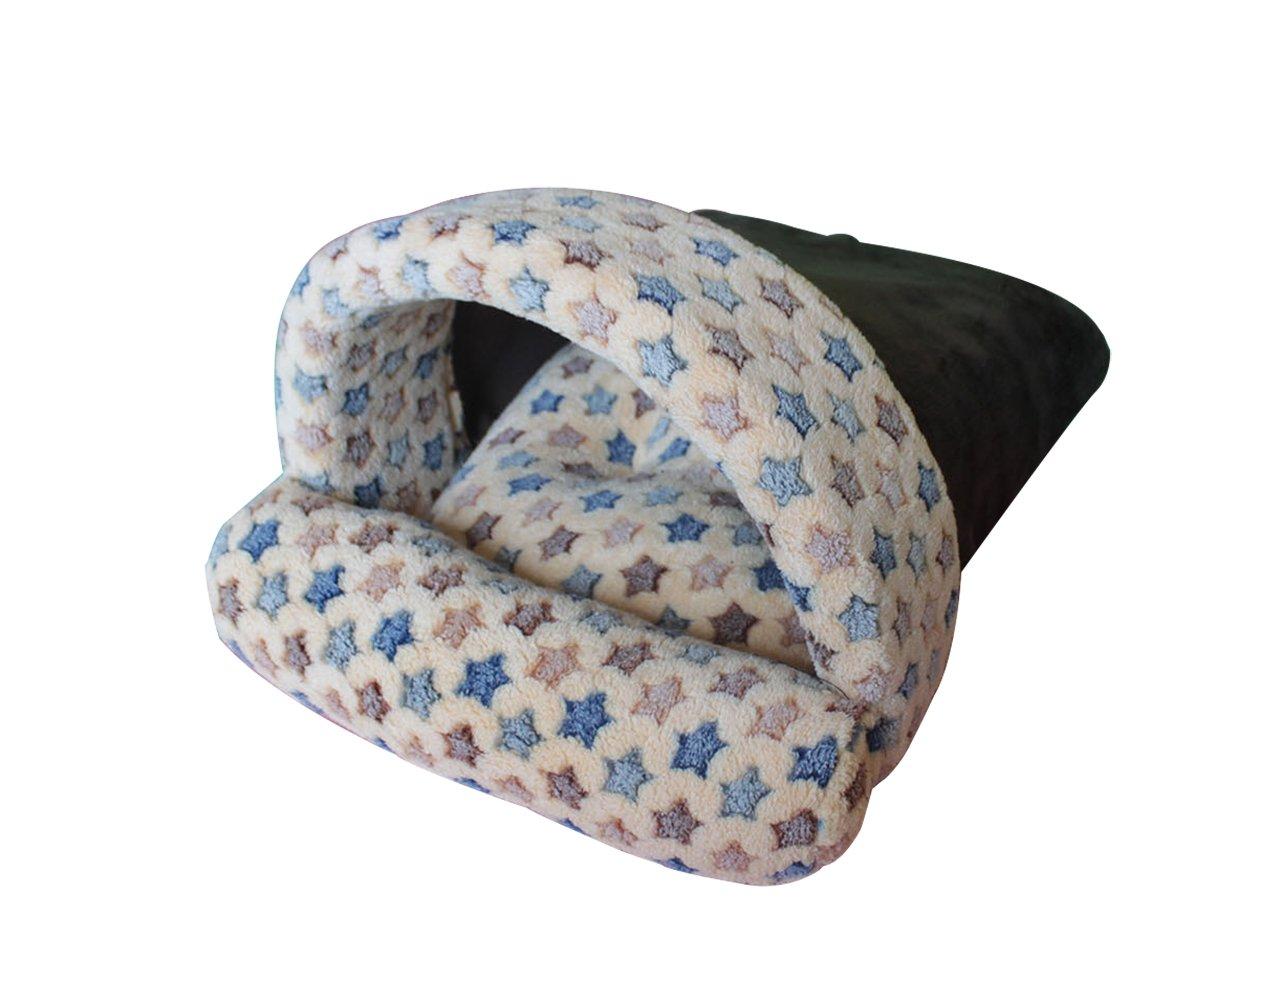 Brown L Brown L Hii-Yo Warm Cozy Pet Cave Nest Dog Cat Coral Fleece Flower Print Winter Sleeping Beds (Brown, L)